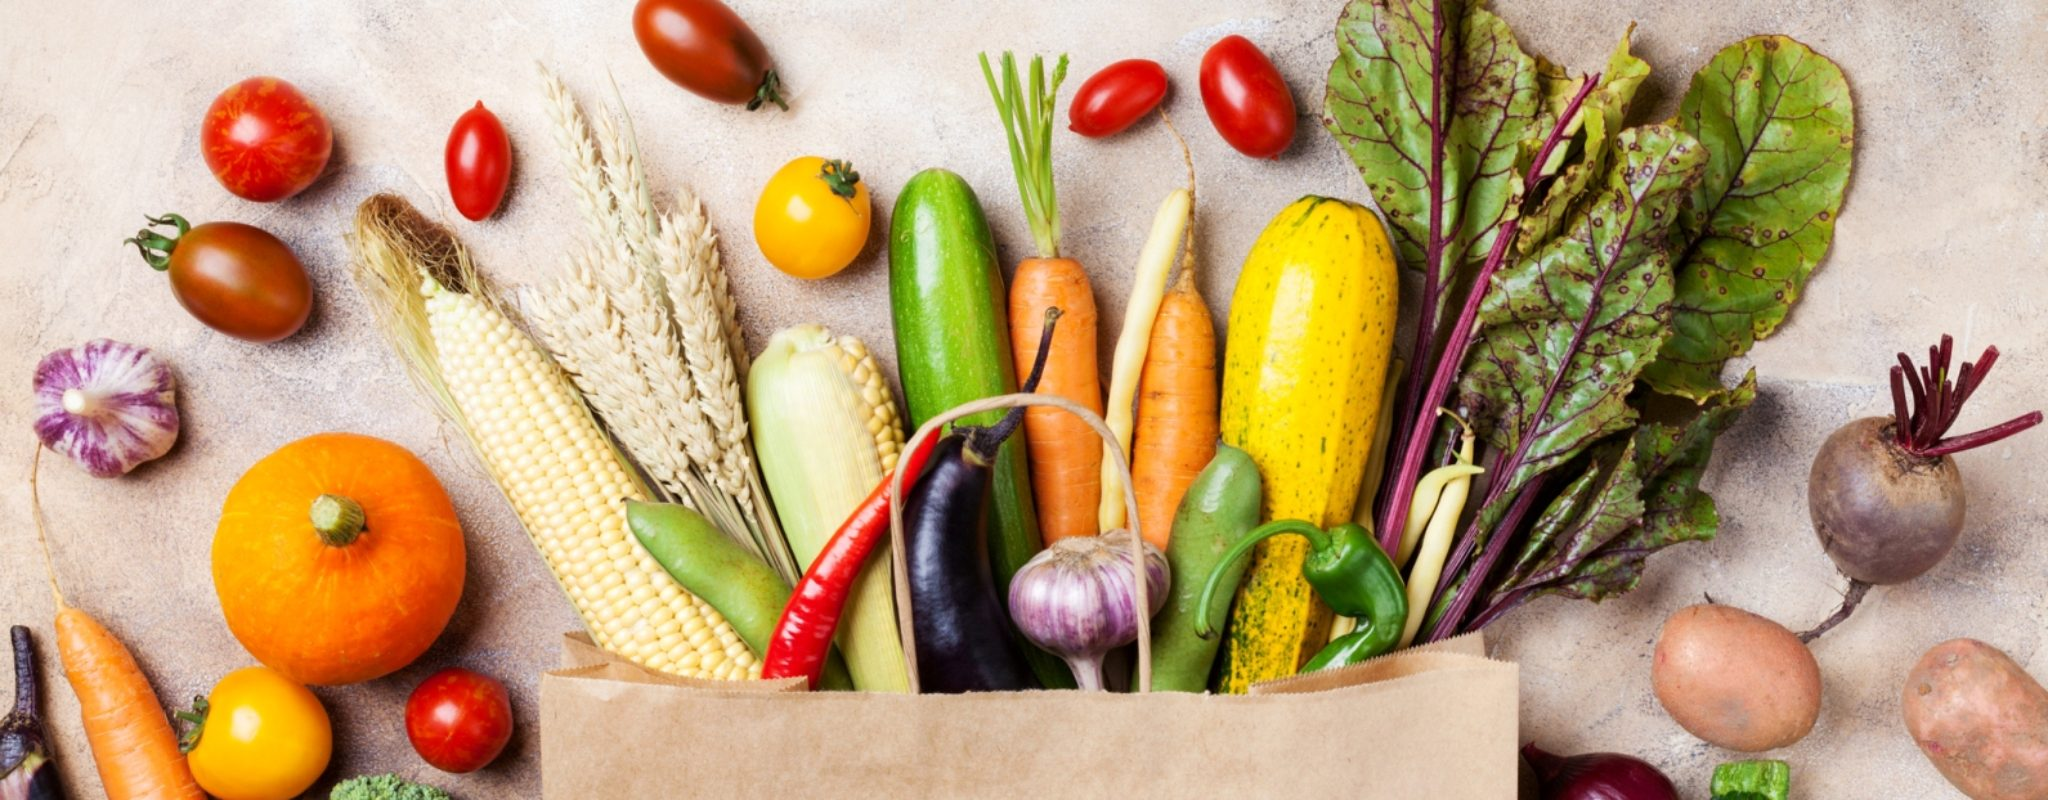 Seasonal Eating: Fall and Winter Produce